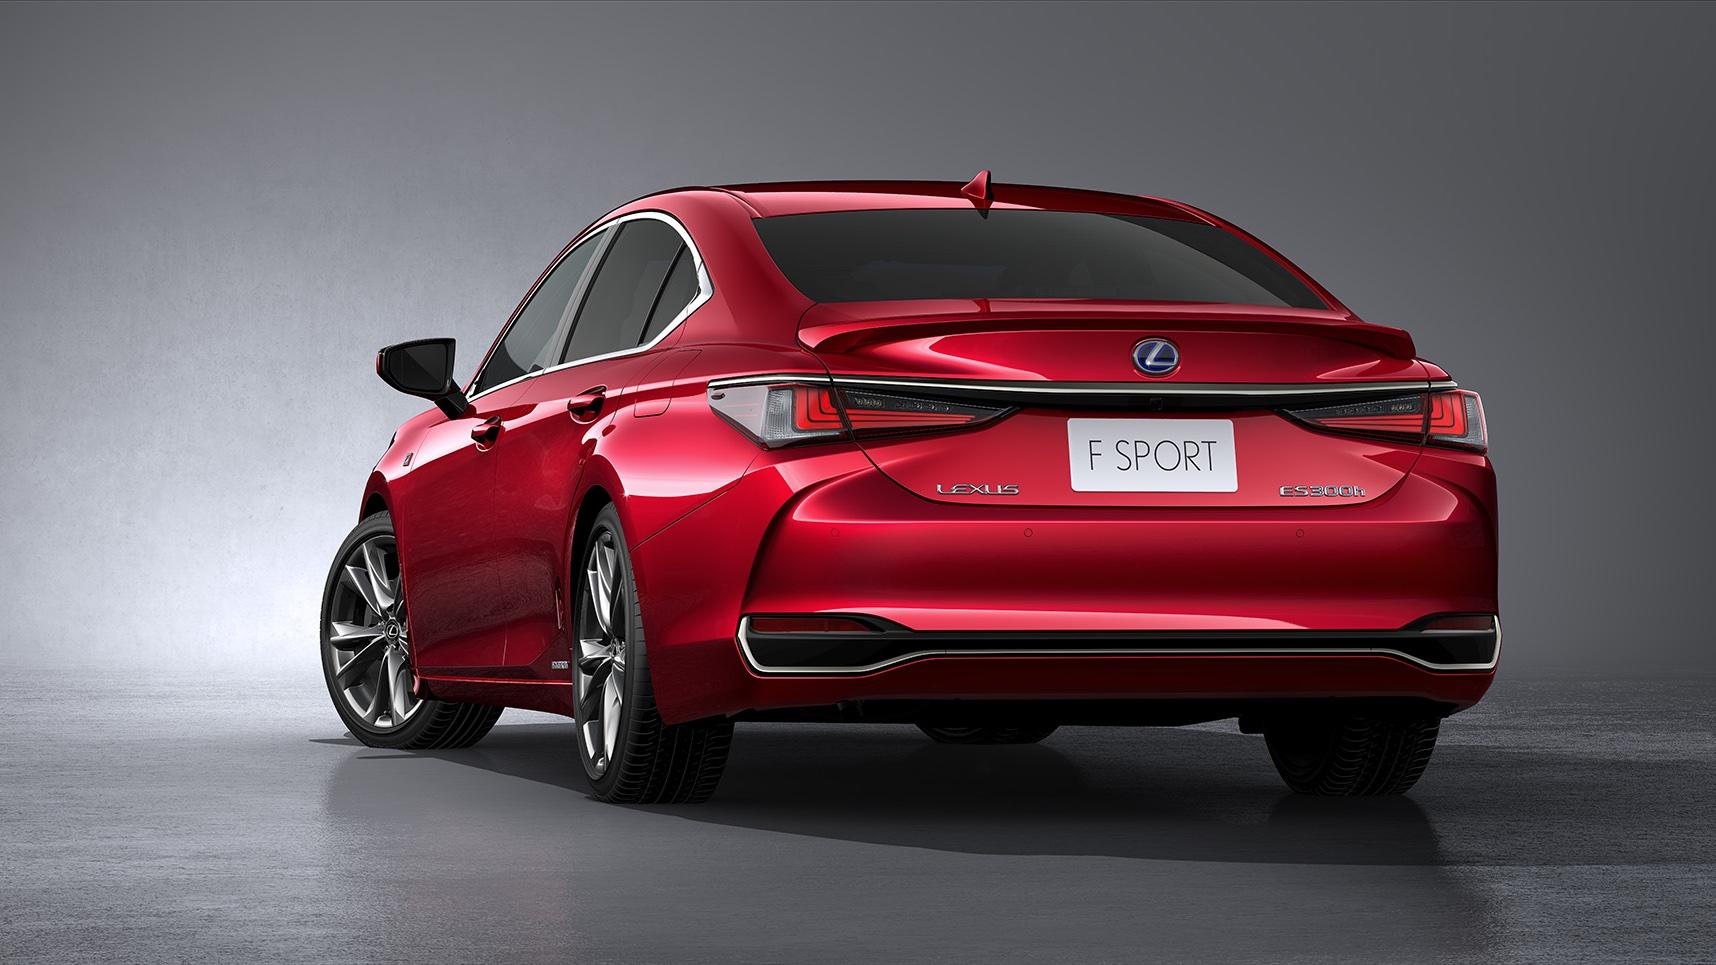 2020 Lexus ES F Sport red rear end